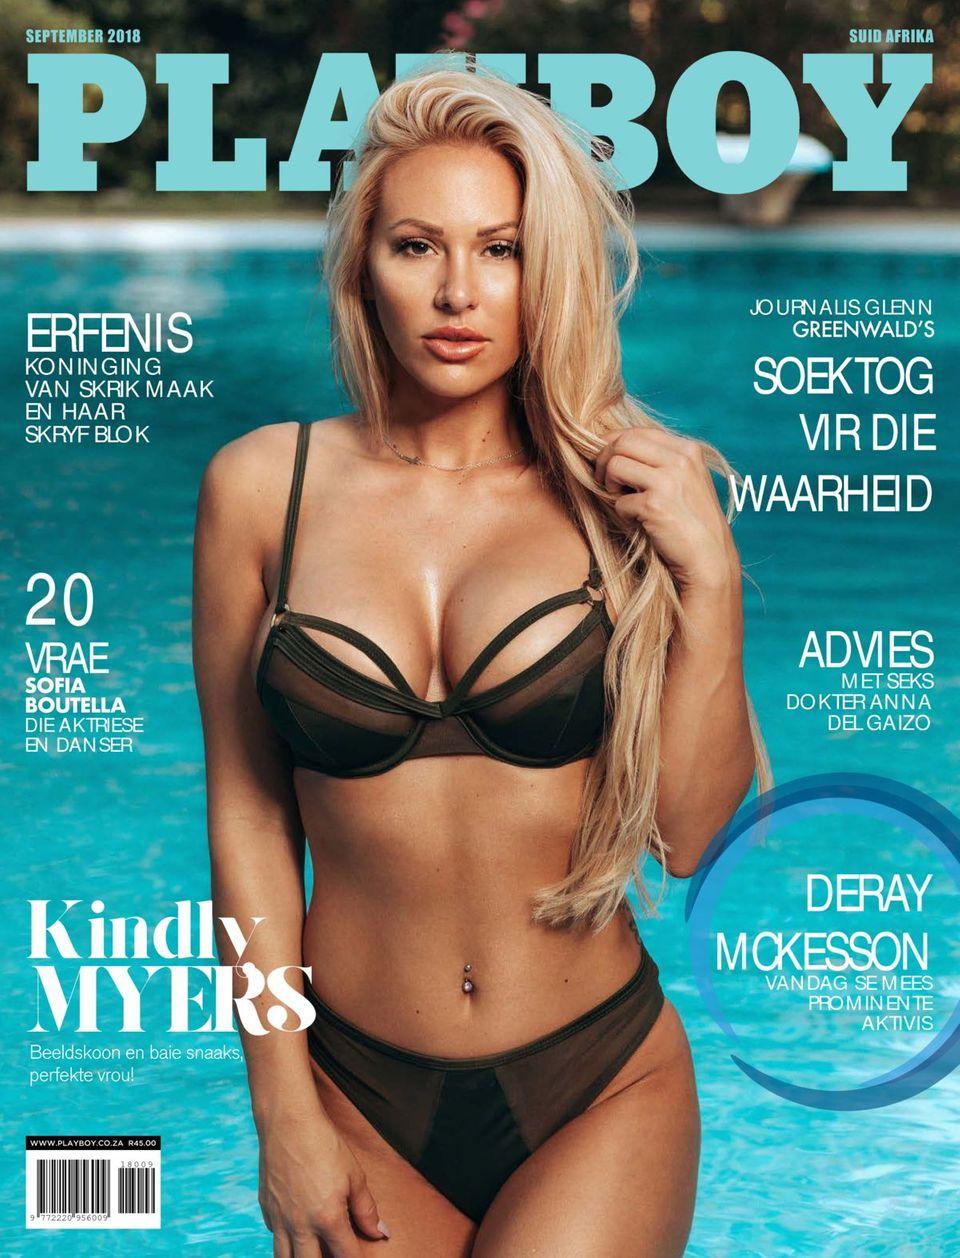 Playboy Suid Afrika-September 2018 Magazine - Get your